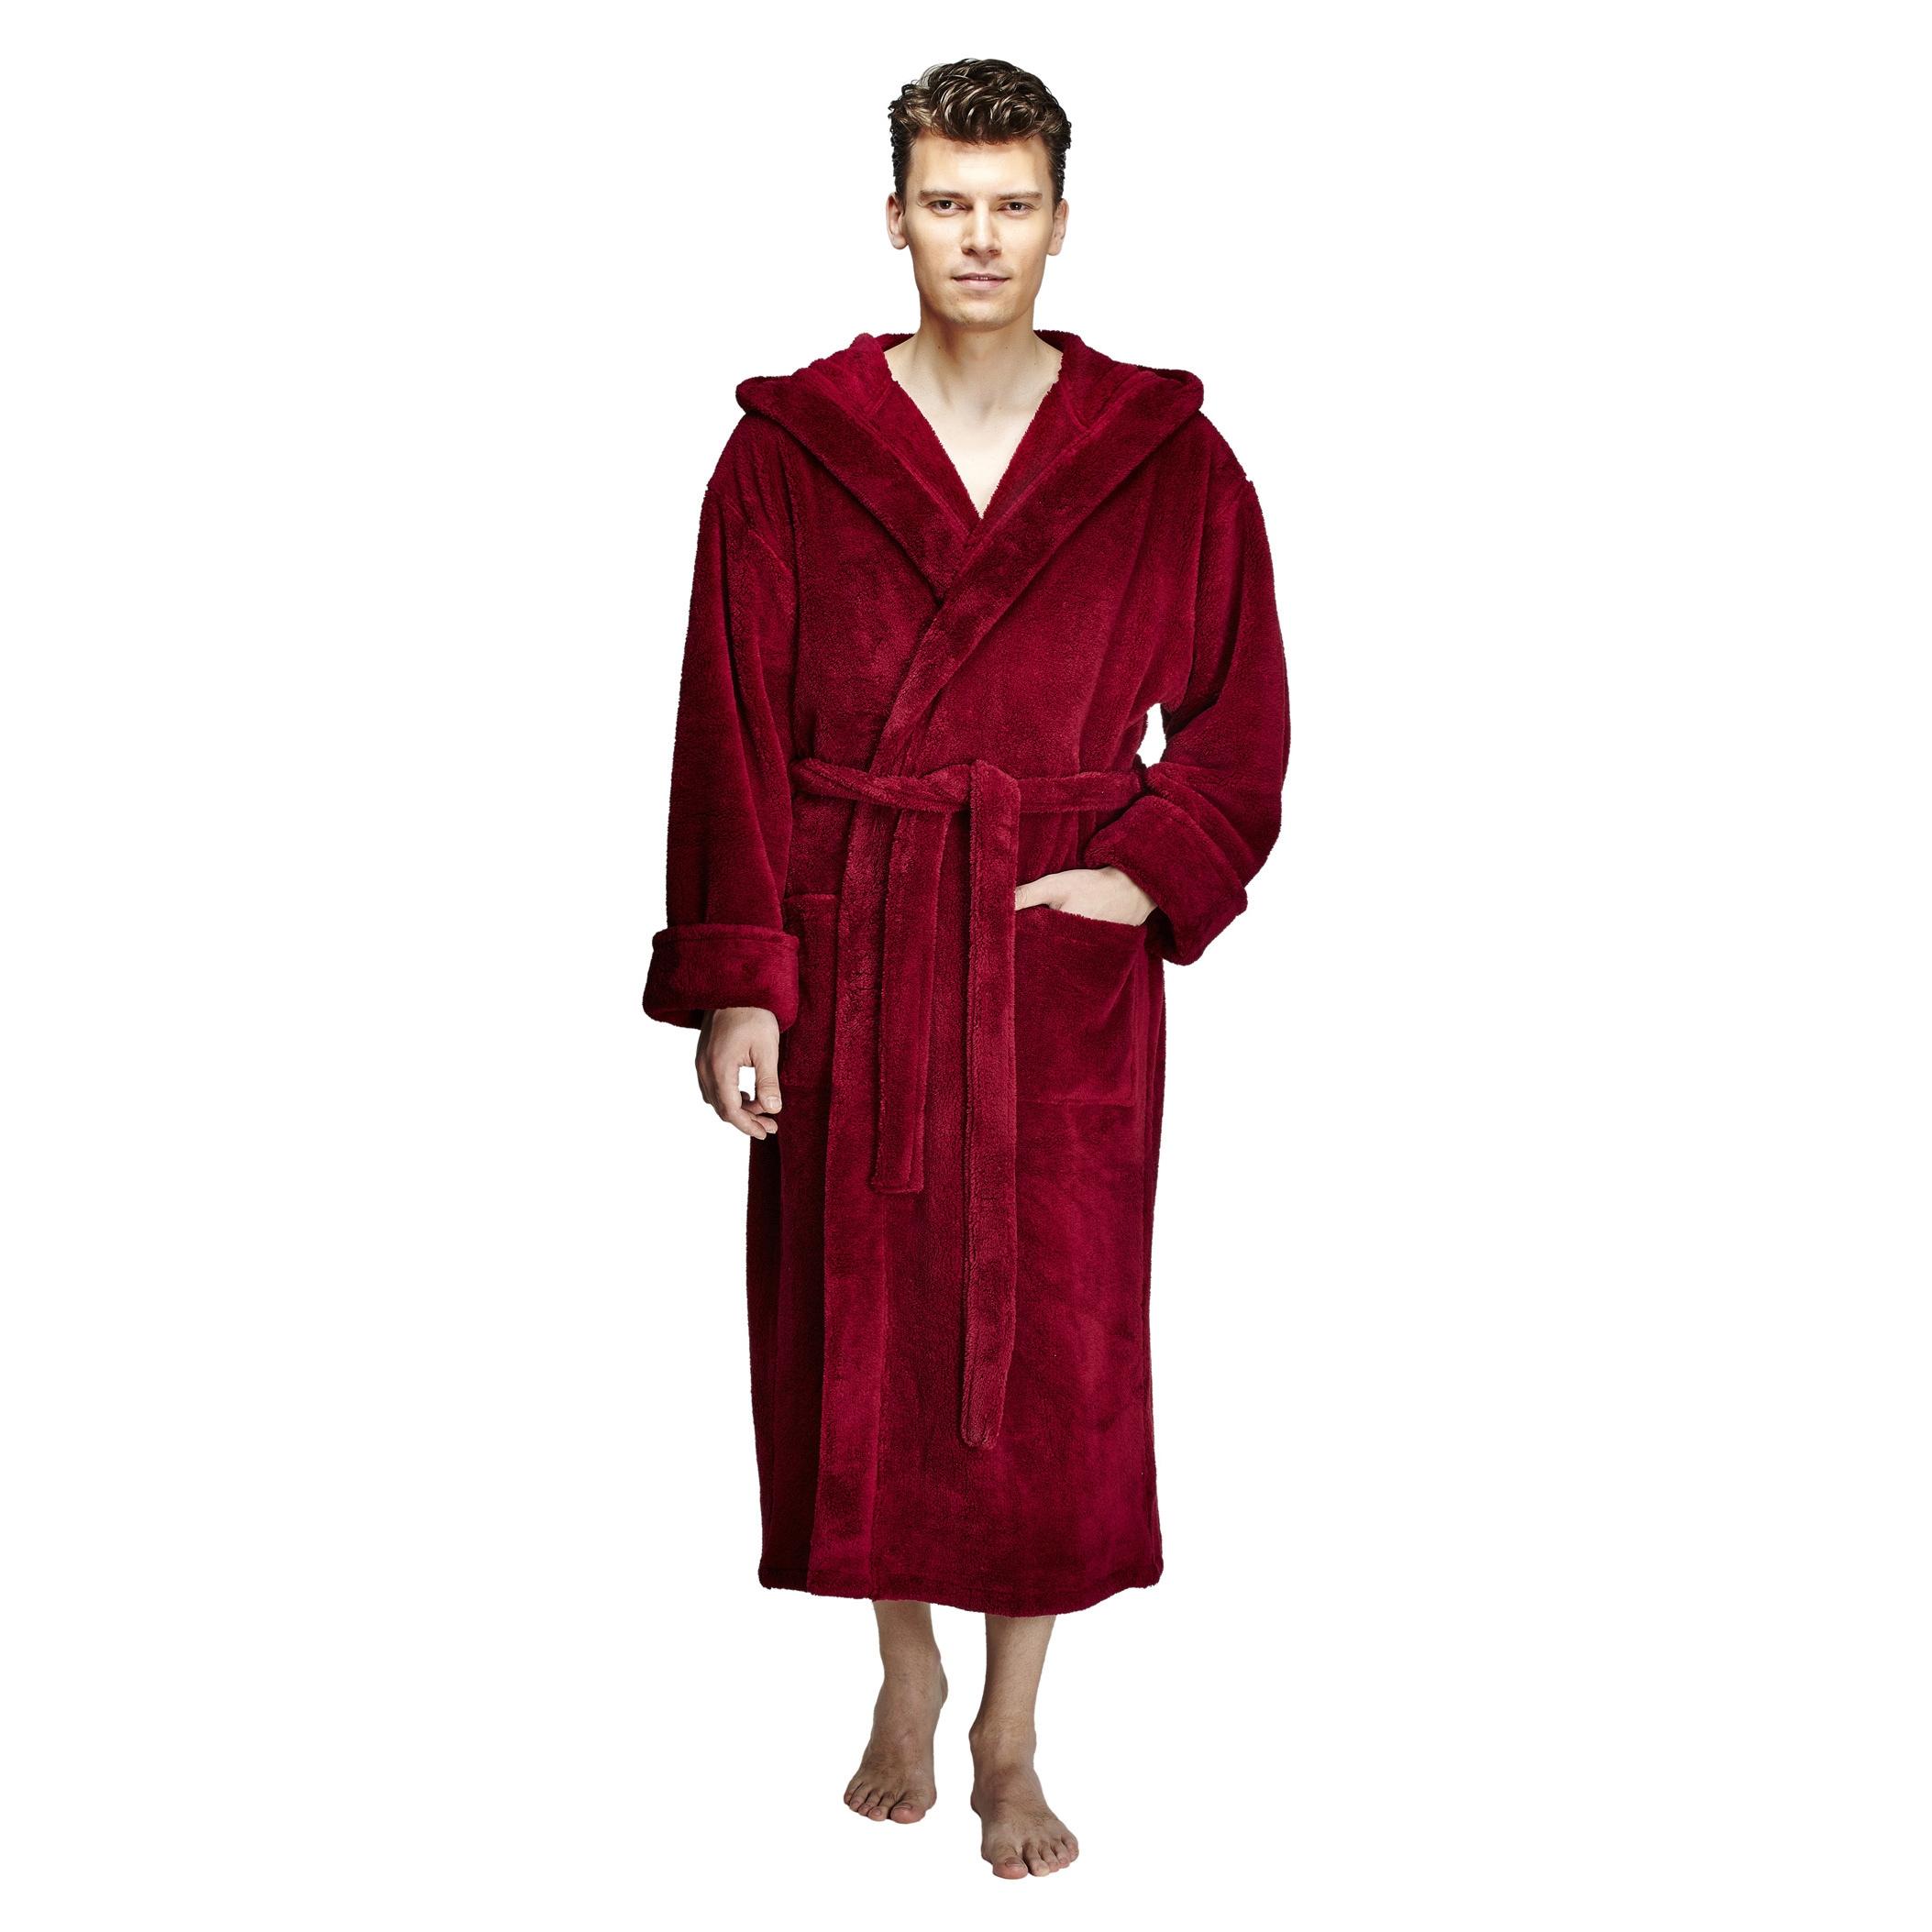 a1b2056678 Shop Men s Hooded Fleece Bathrobe Turkish Soft Plush Robe - Free ...